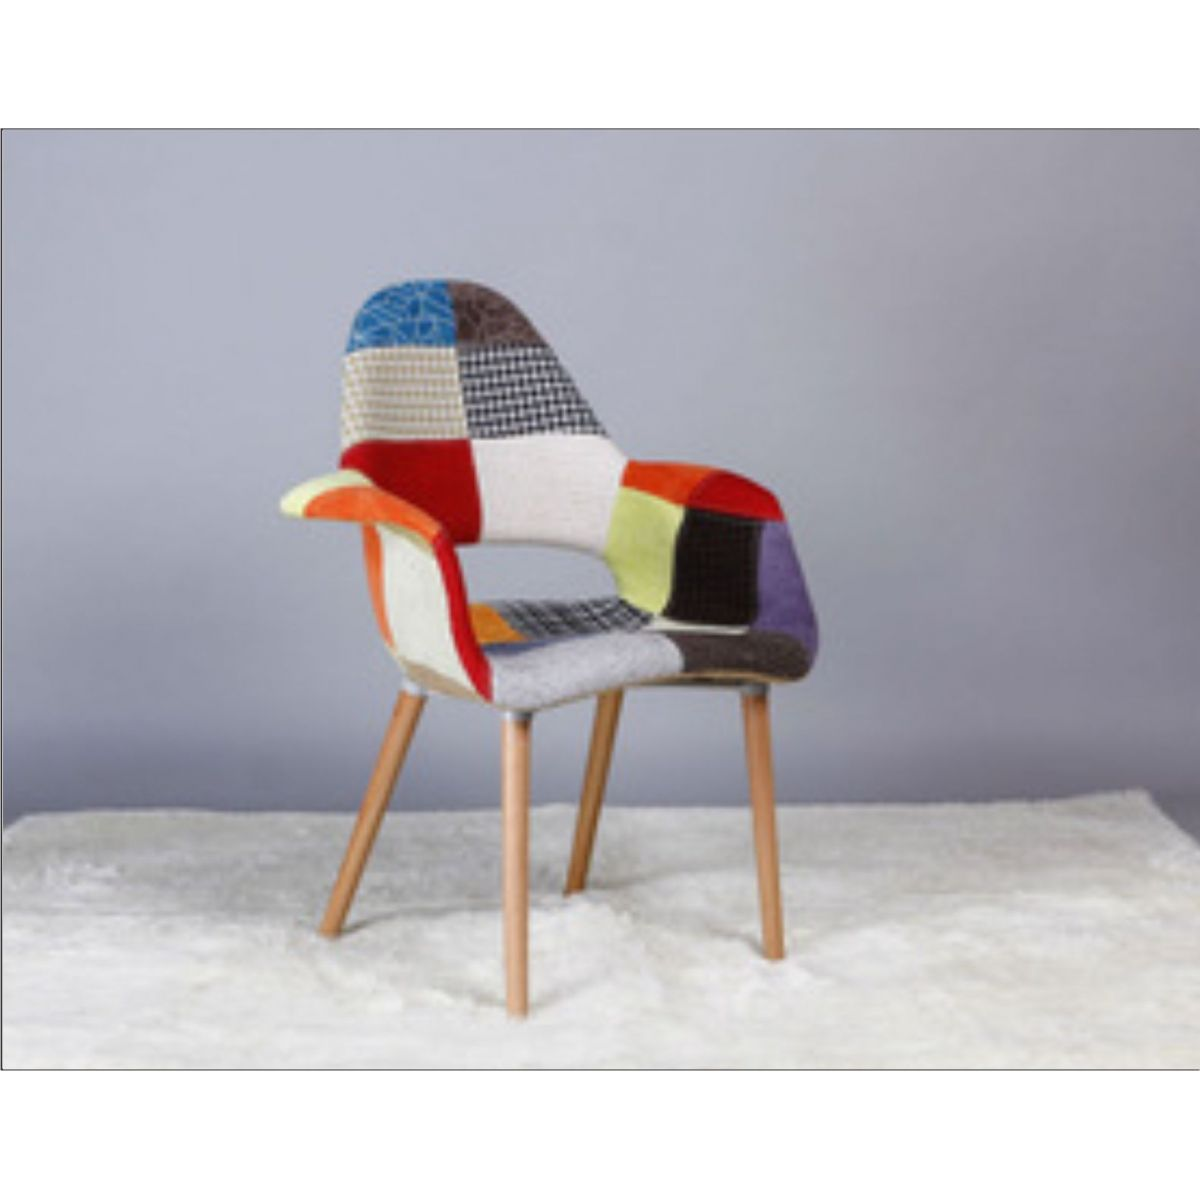 Cadeira Charles Eames Patchwork Orgânica Pelegrin FW-073F